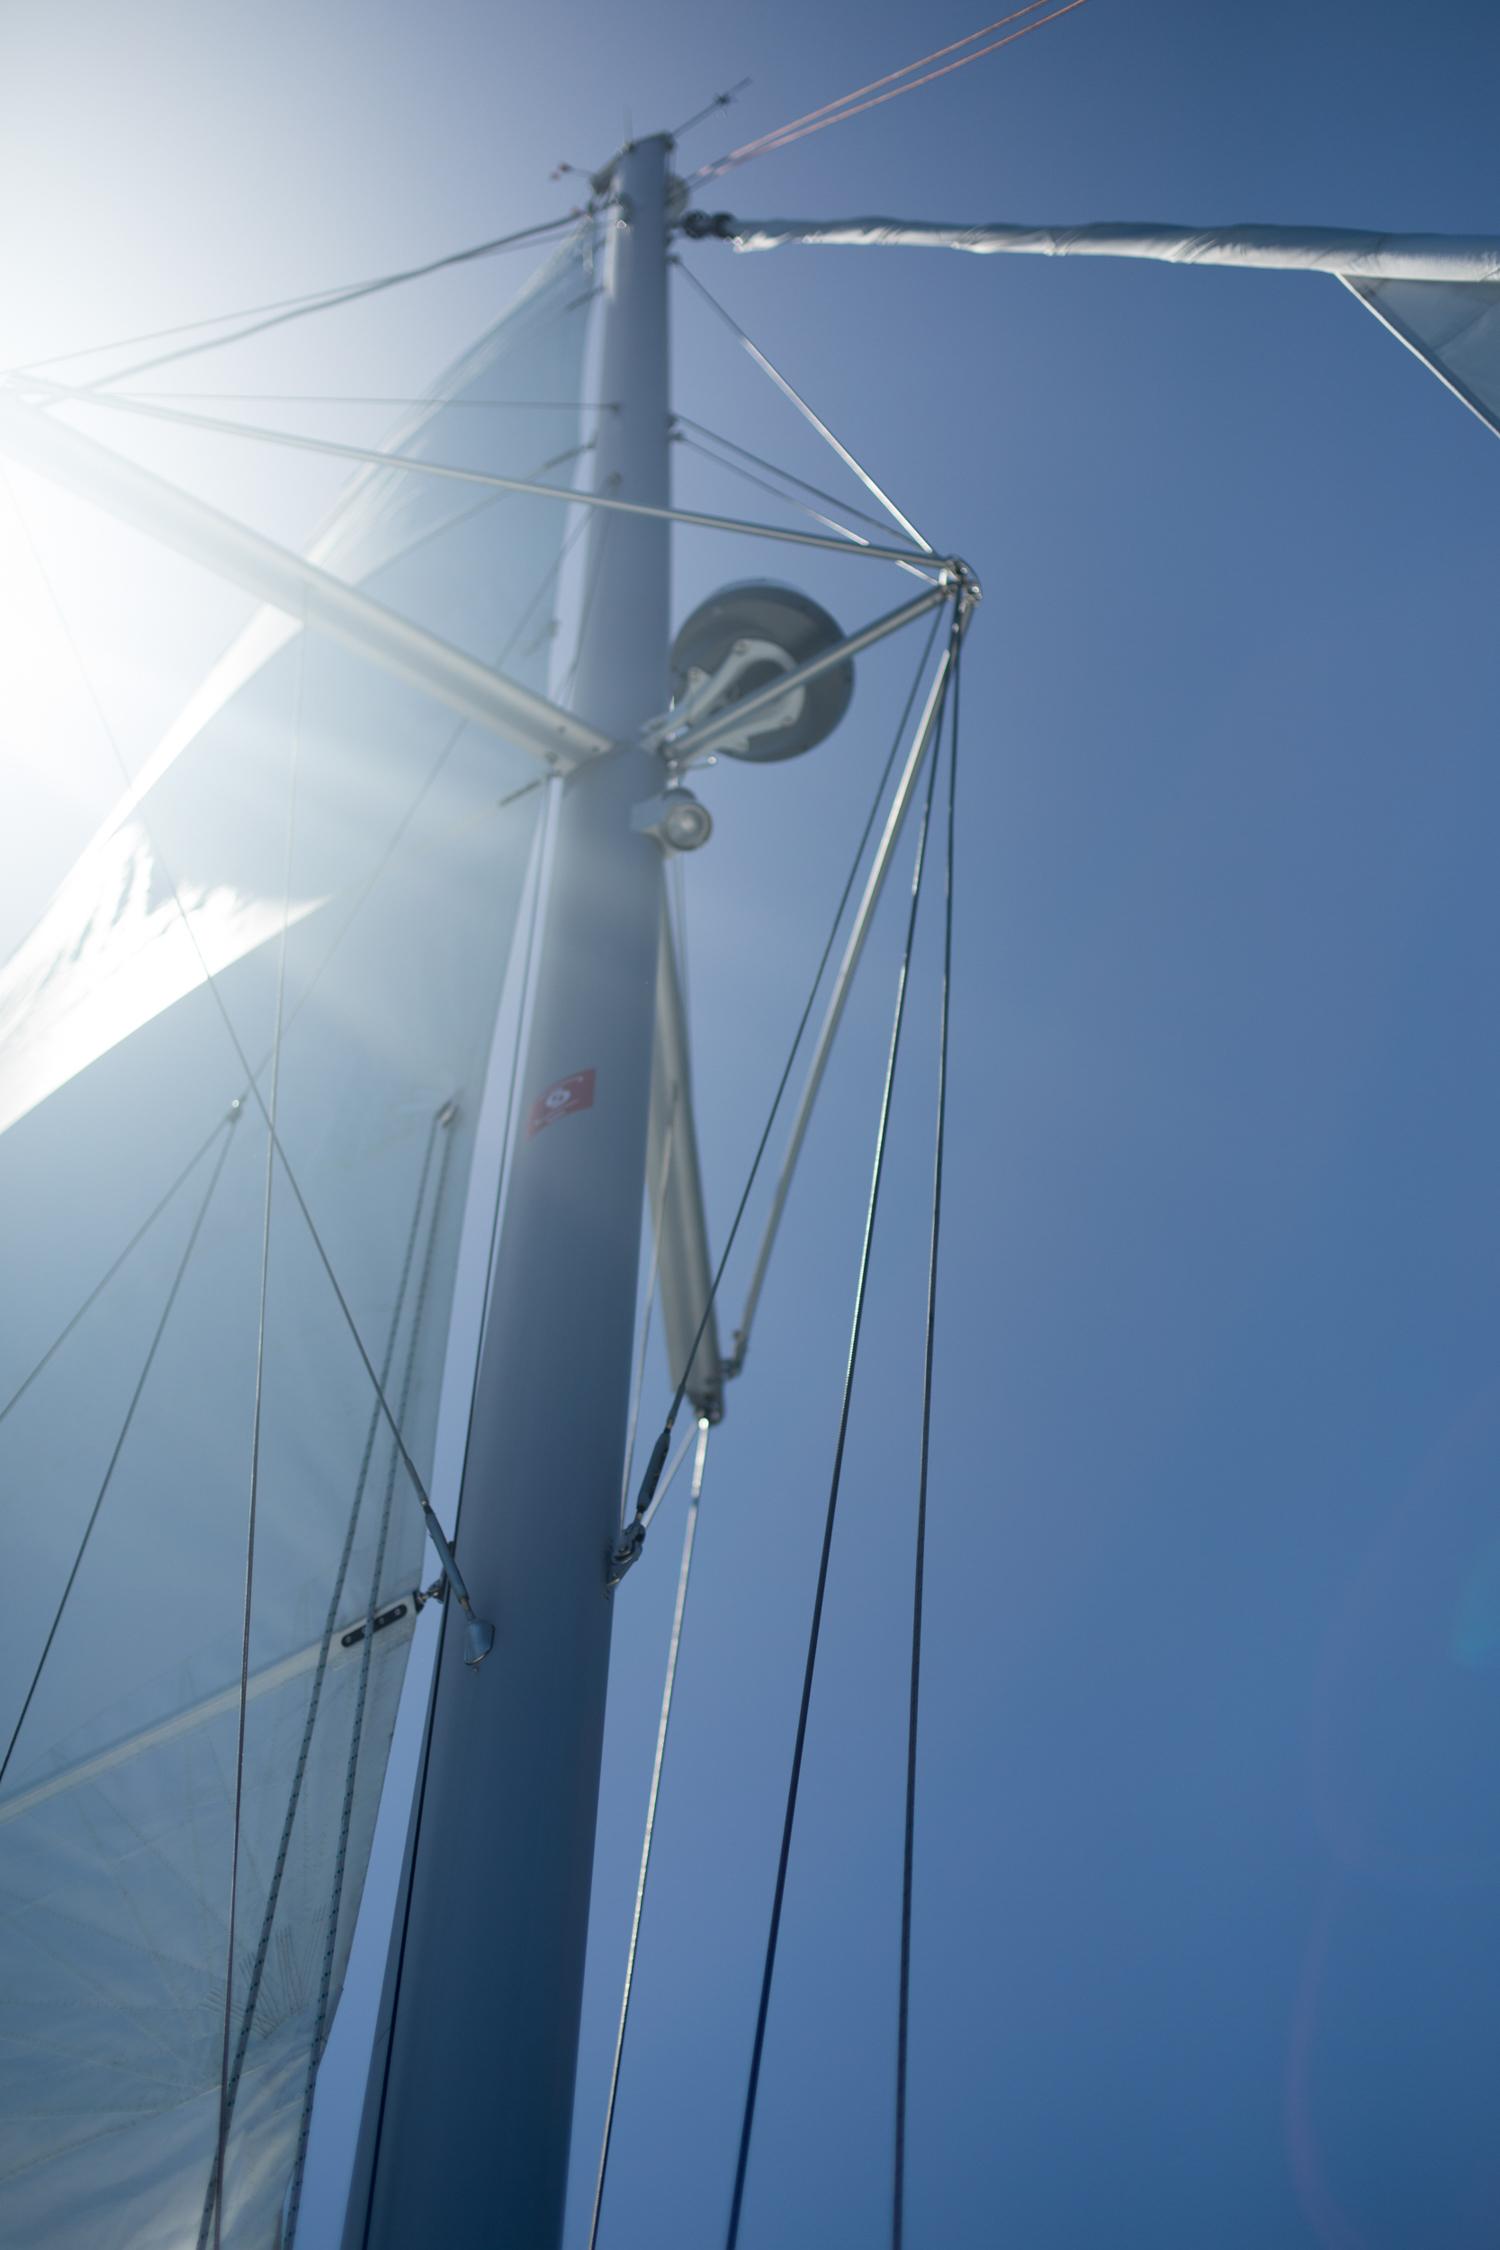 A day sailing | A Fabulous Fete